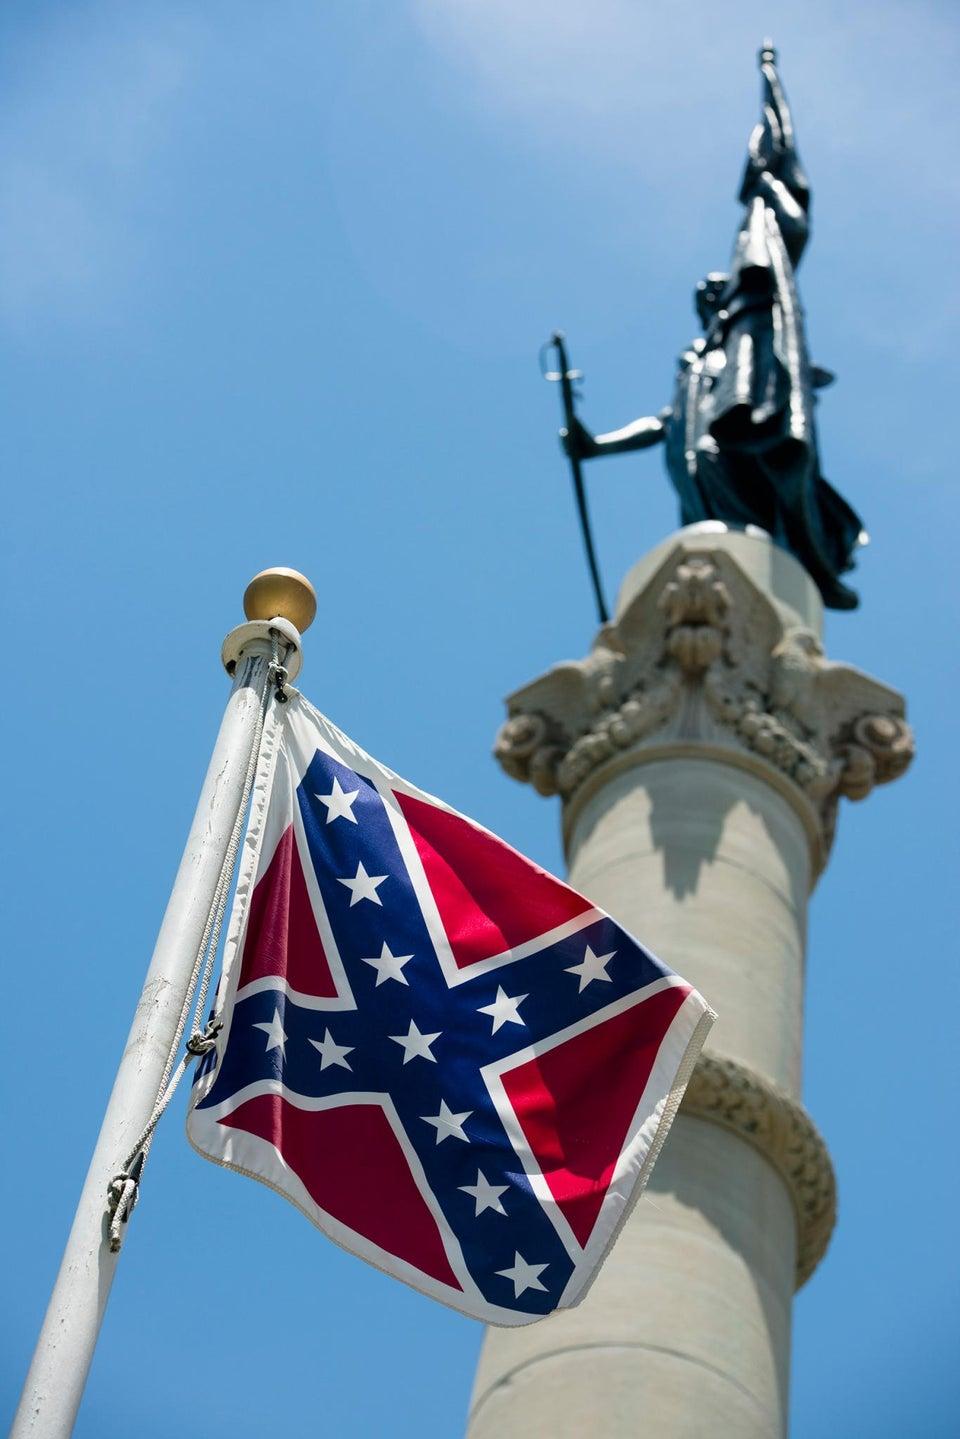 South Carolina Governor: 'It's Time to Remove the Confederate Flag'